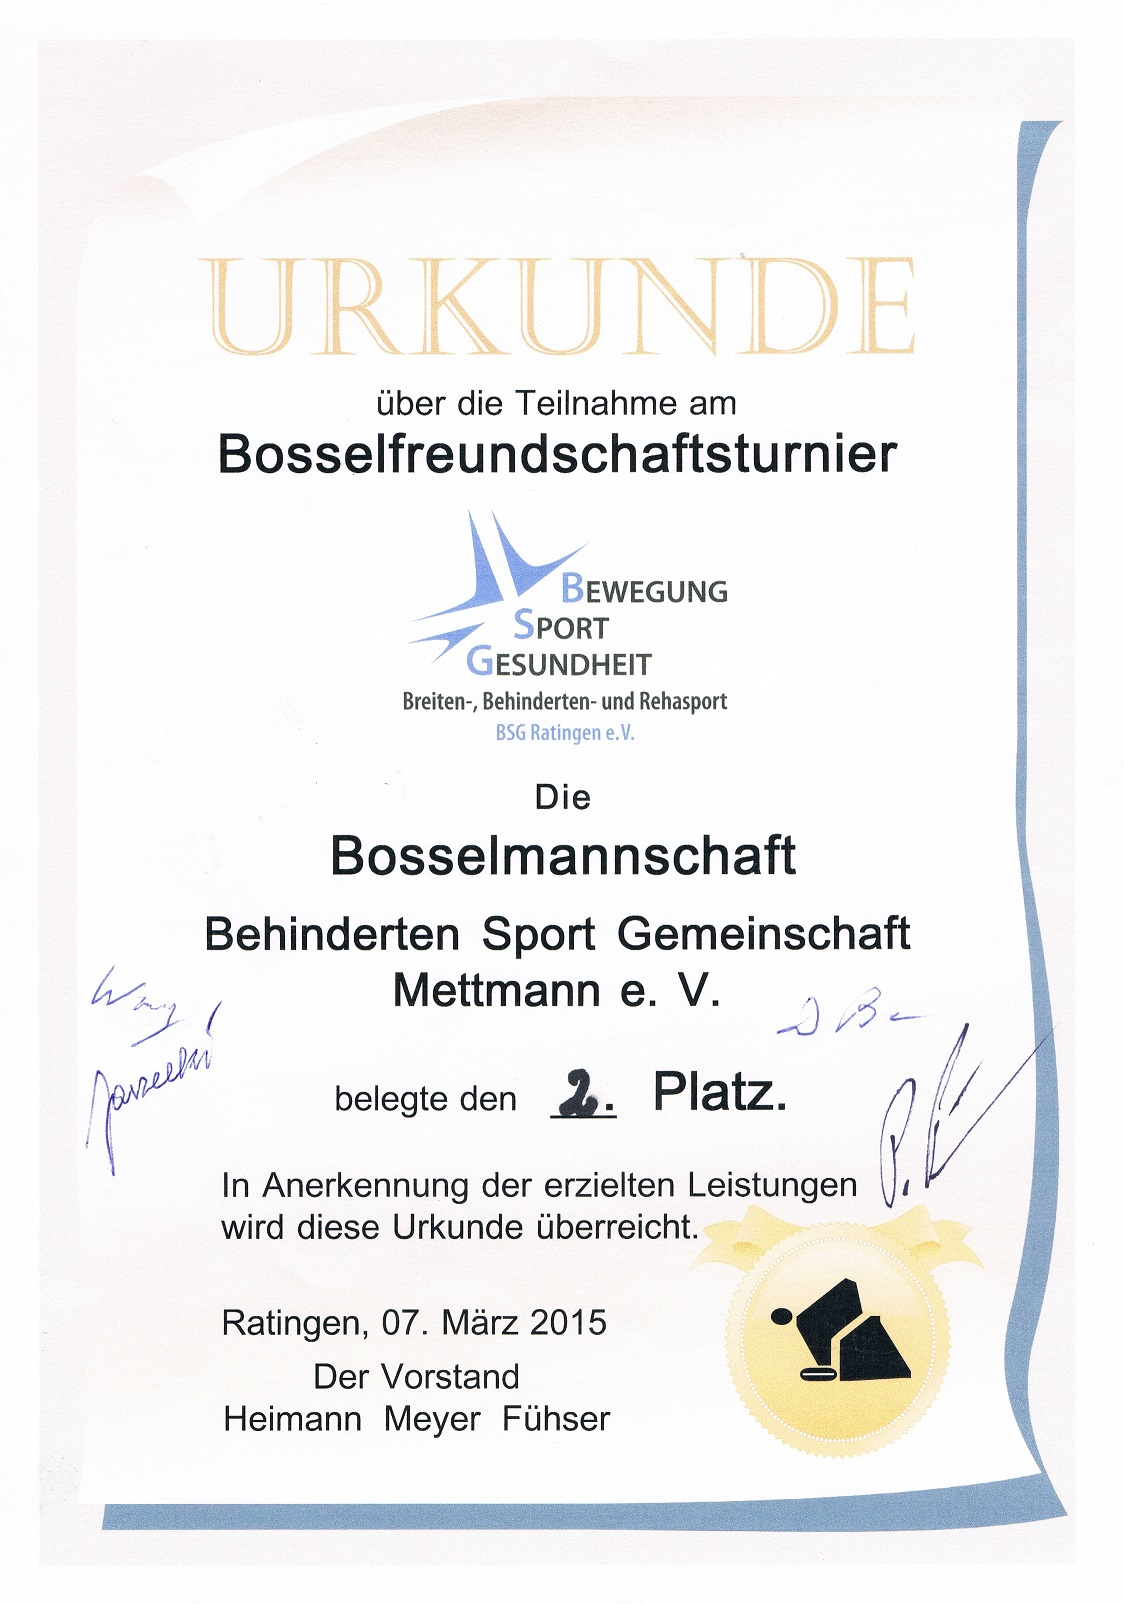 Bosseln -Ratingen am 14.03.2015